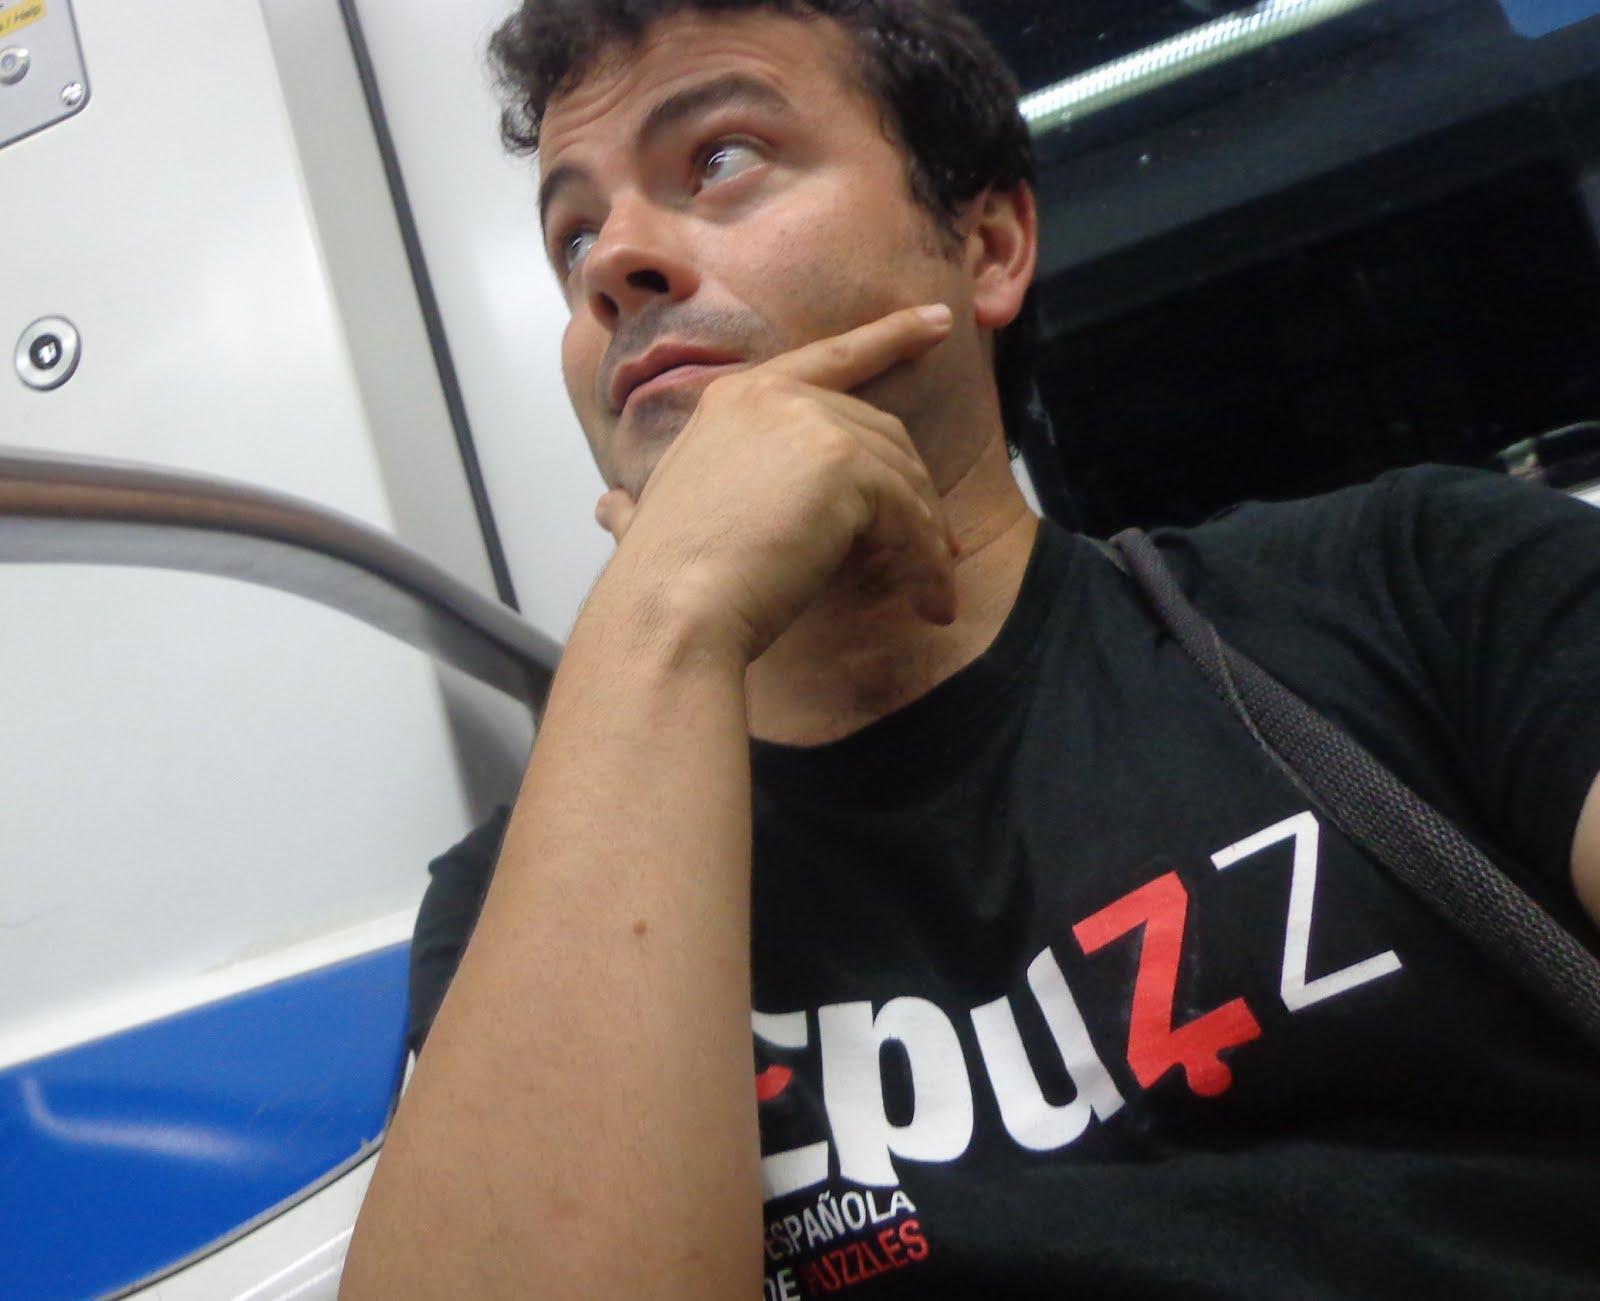 Alejandro Darias Mateos